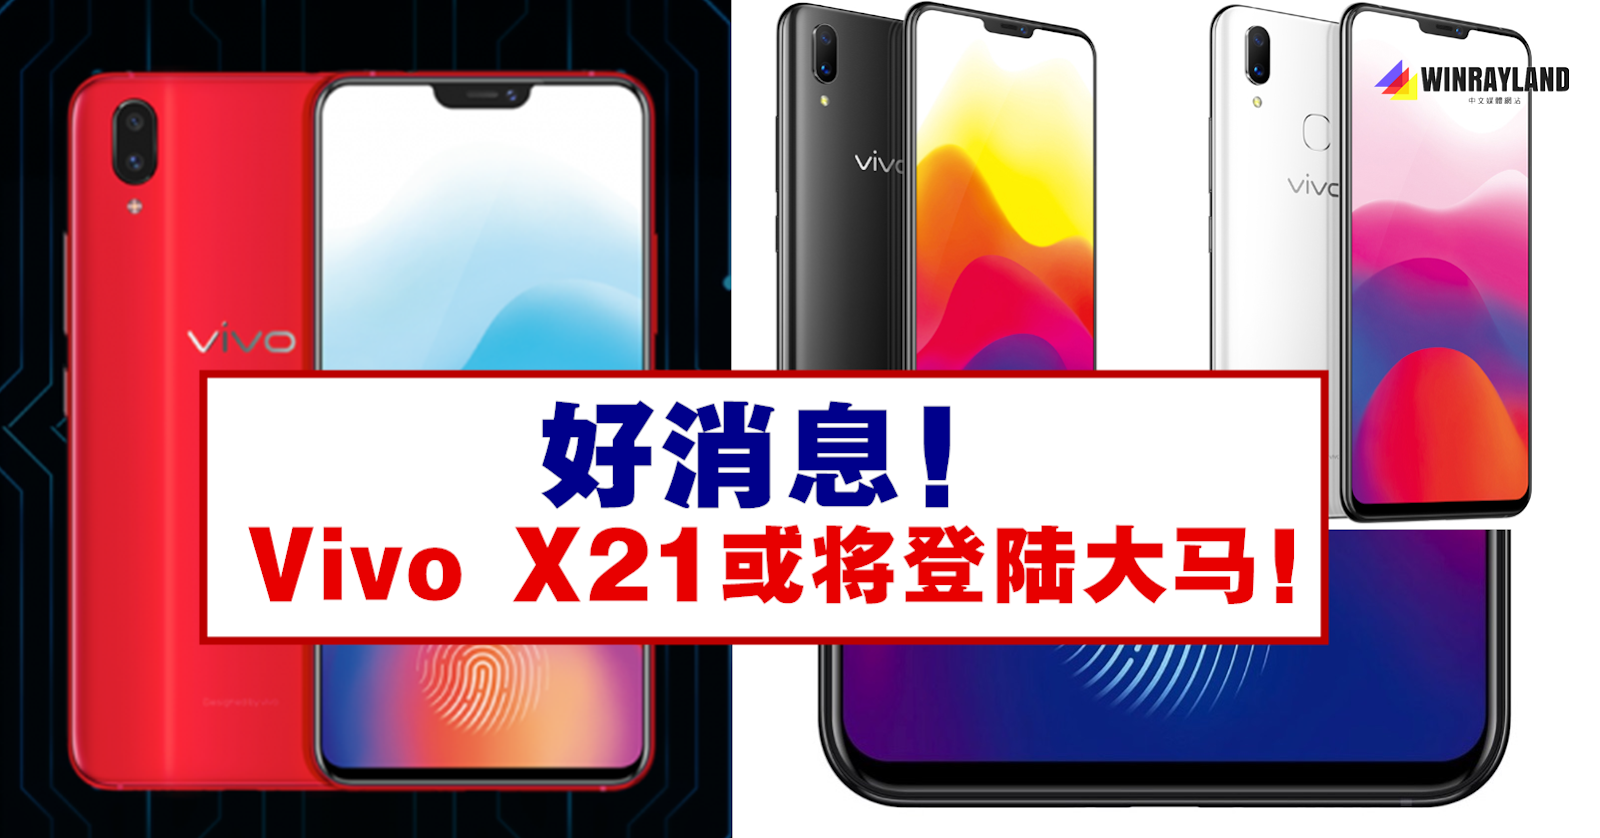 Vivo X21或将登陆大马!